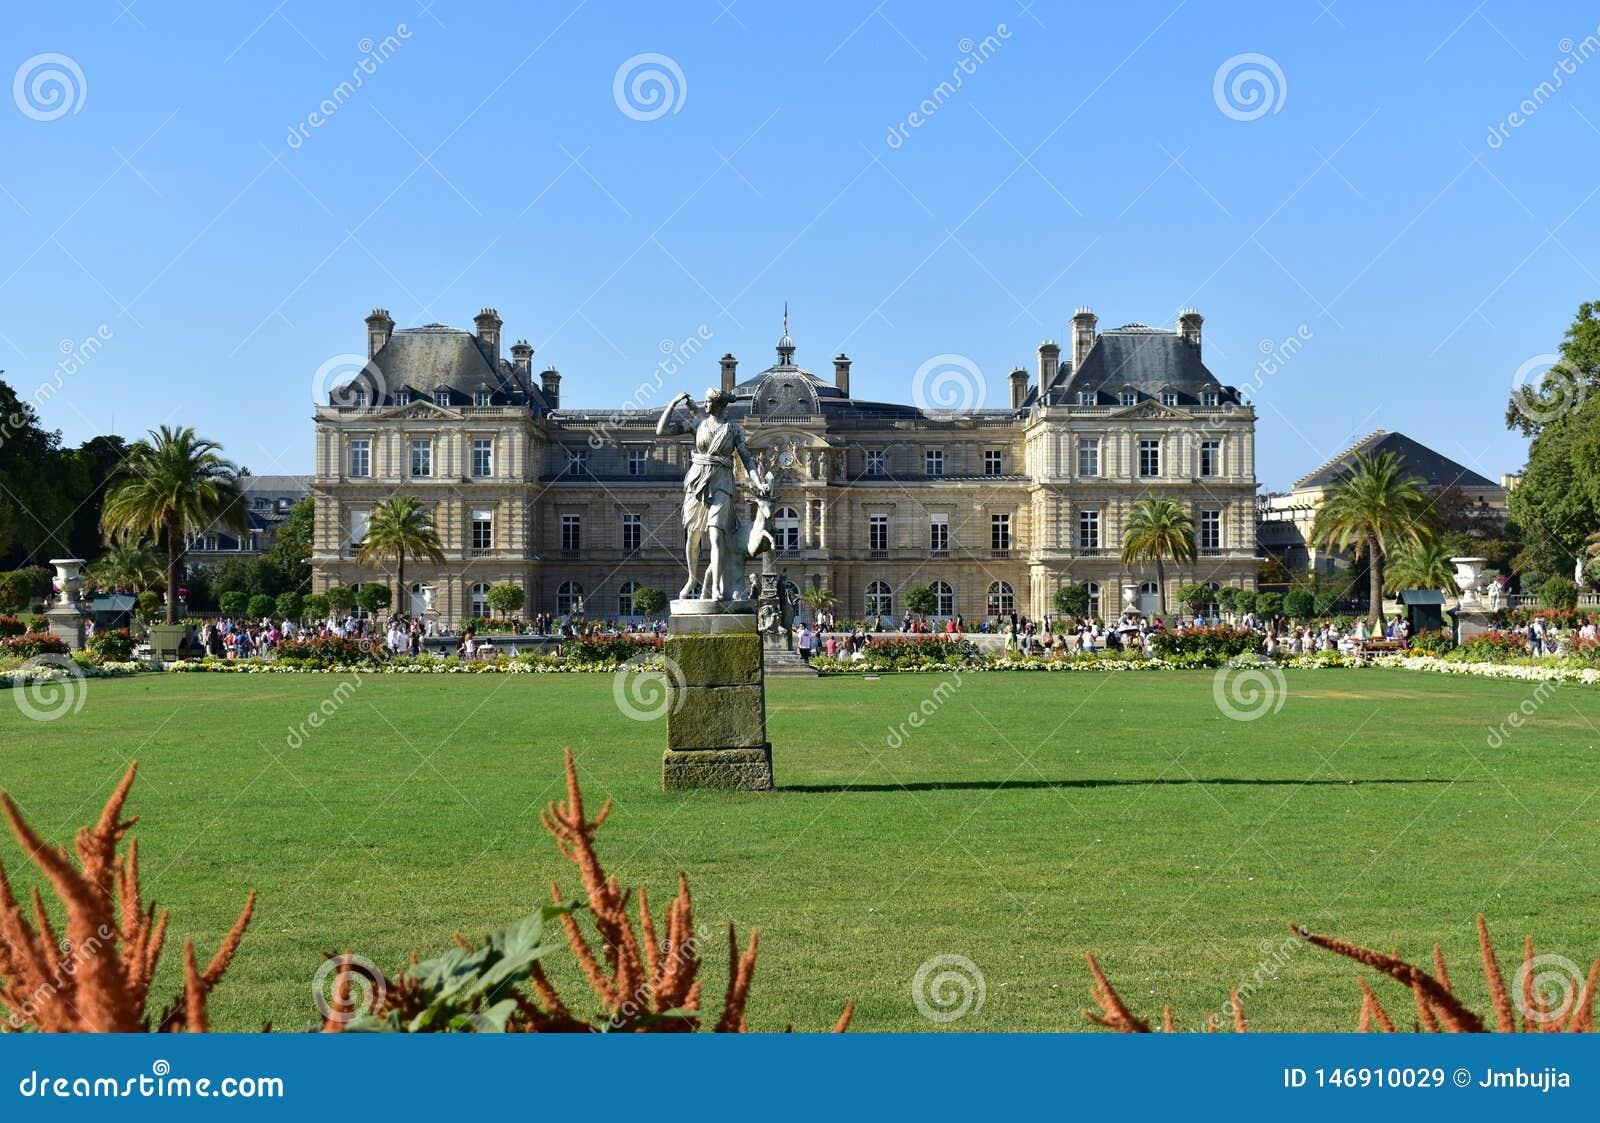 Jardin du Λουξεμβούργο, κήποι και παλάτι, χλόη, λουλούδια και άγαλμα, ηλιόλουστη ημέρα, μπλε ουρανός Παρίσι, Γαλλία, στις 15 Αυγο